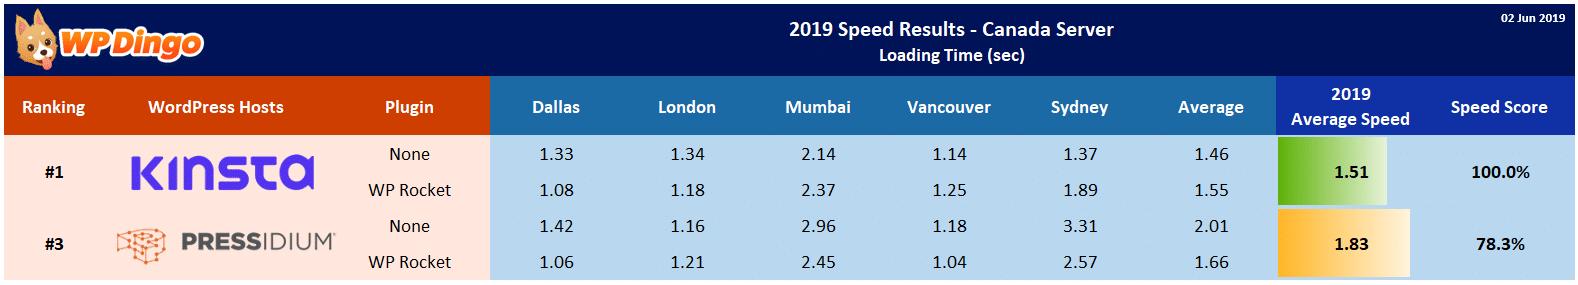 2019 Kinsta vs Pressidium Speed Table - Canada Server